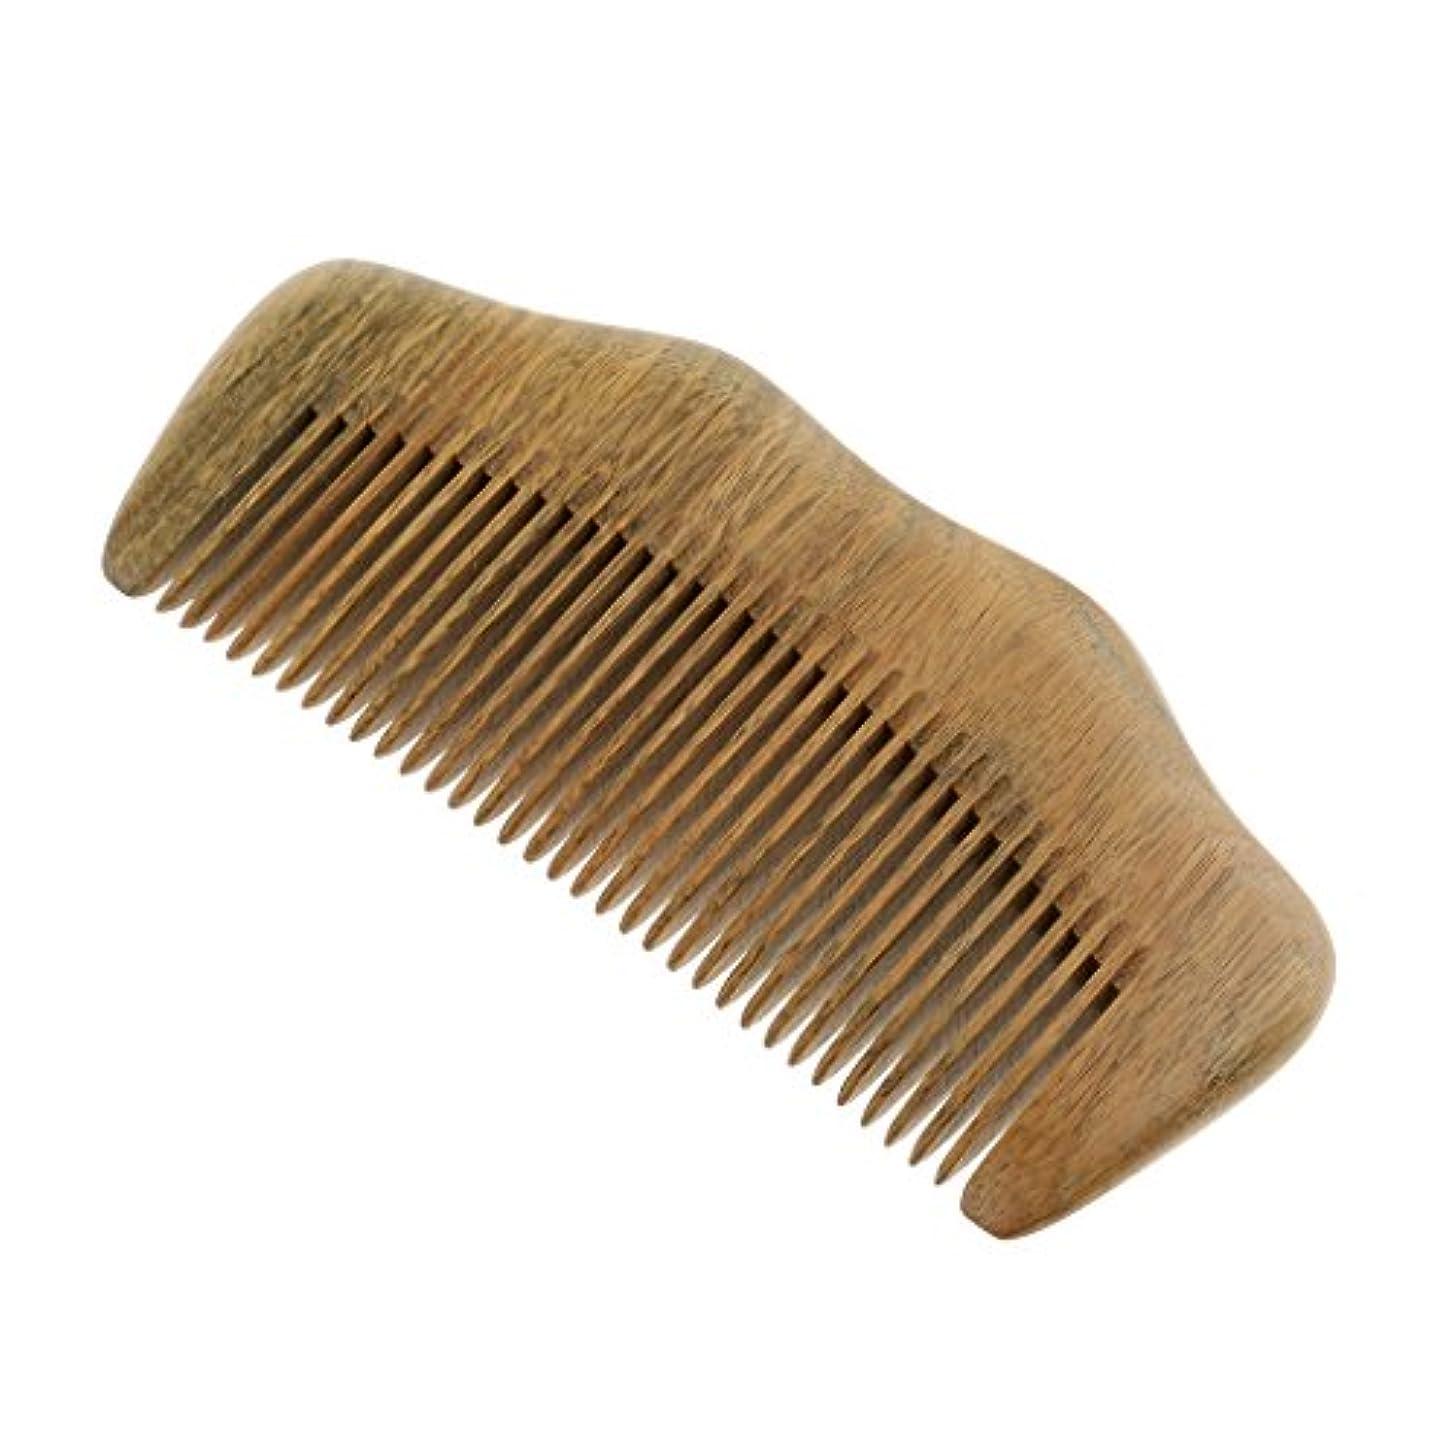 T TOOYFUL ウッドヘアコーム 自然な木 櫛 ヘアケア マッサージ 細かい歯 静電気防止 滑らか